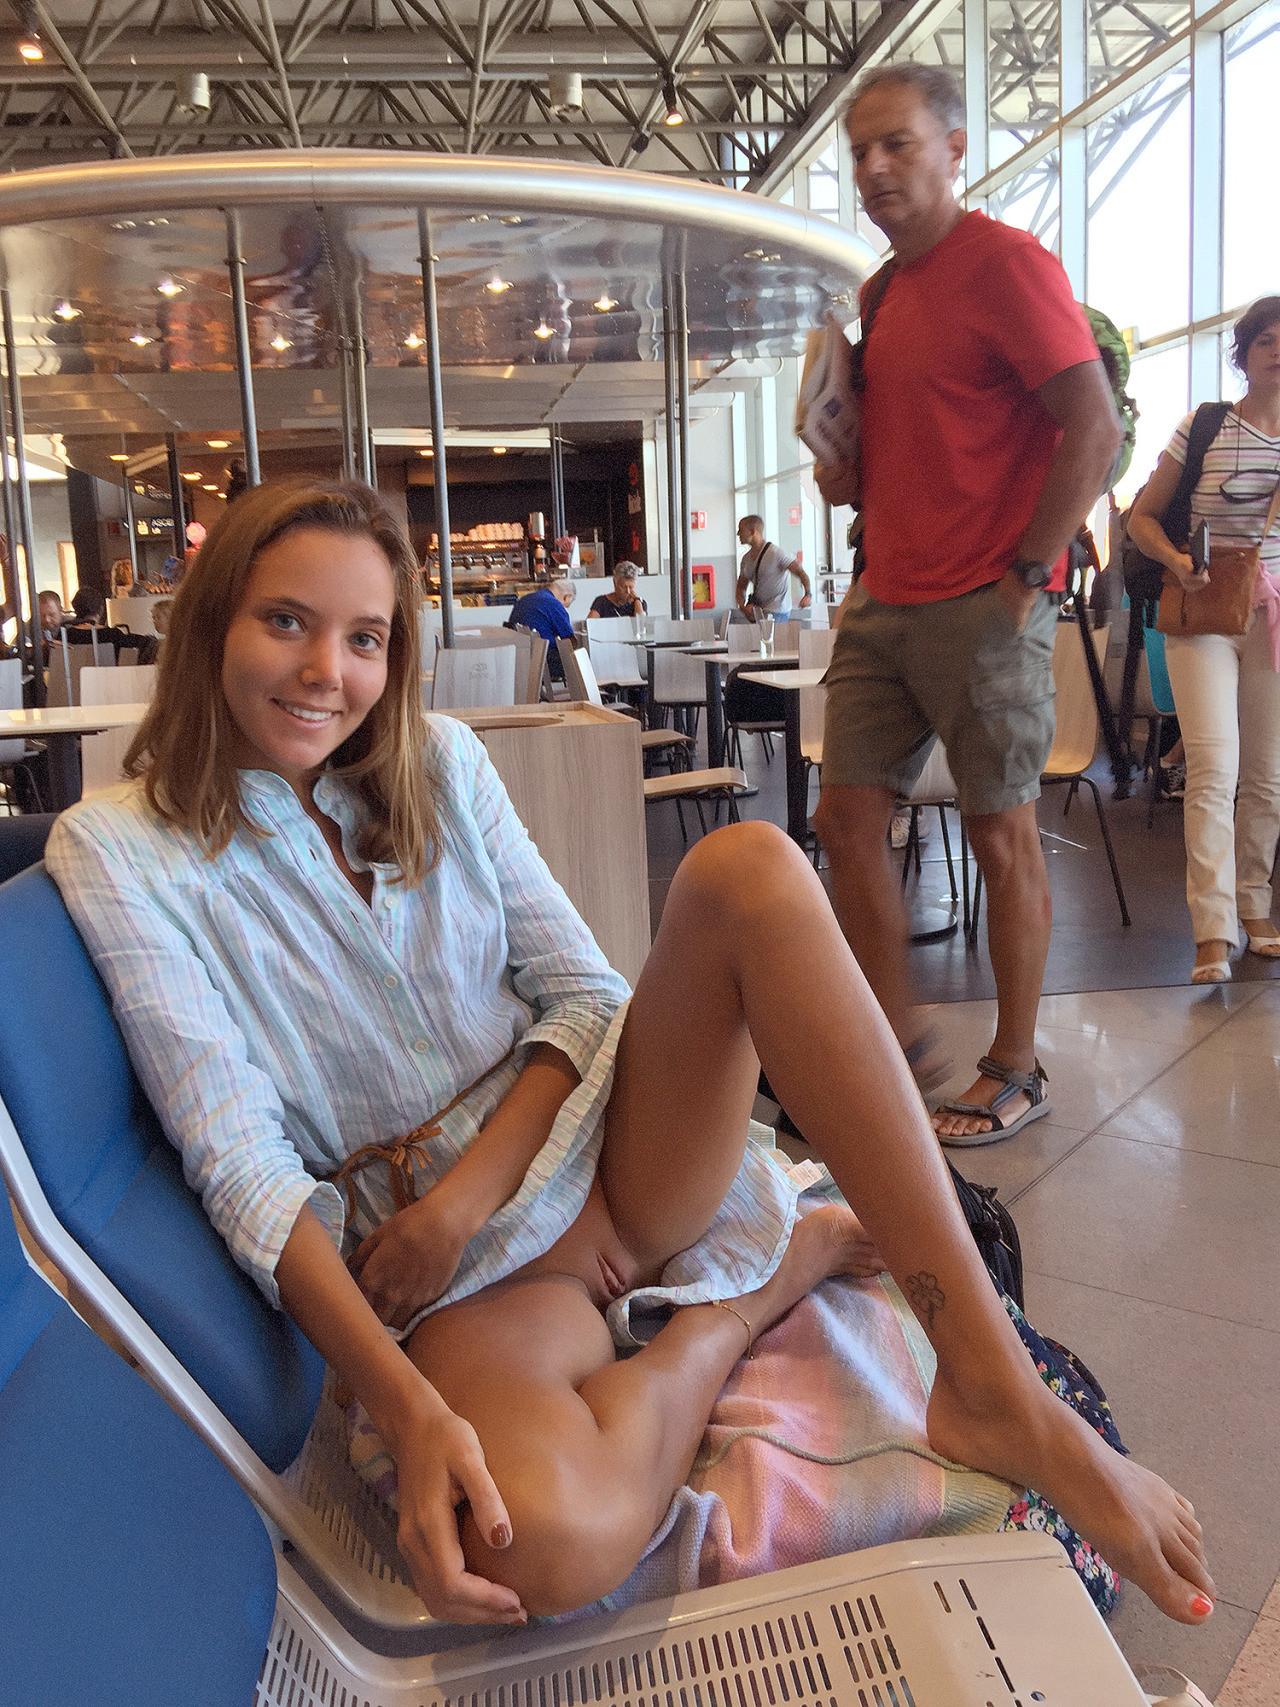 Teen upskirt in public